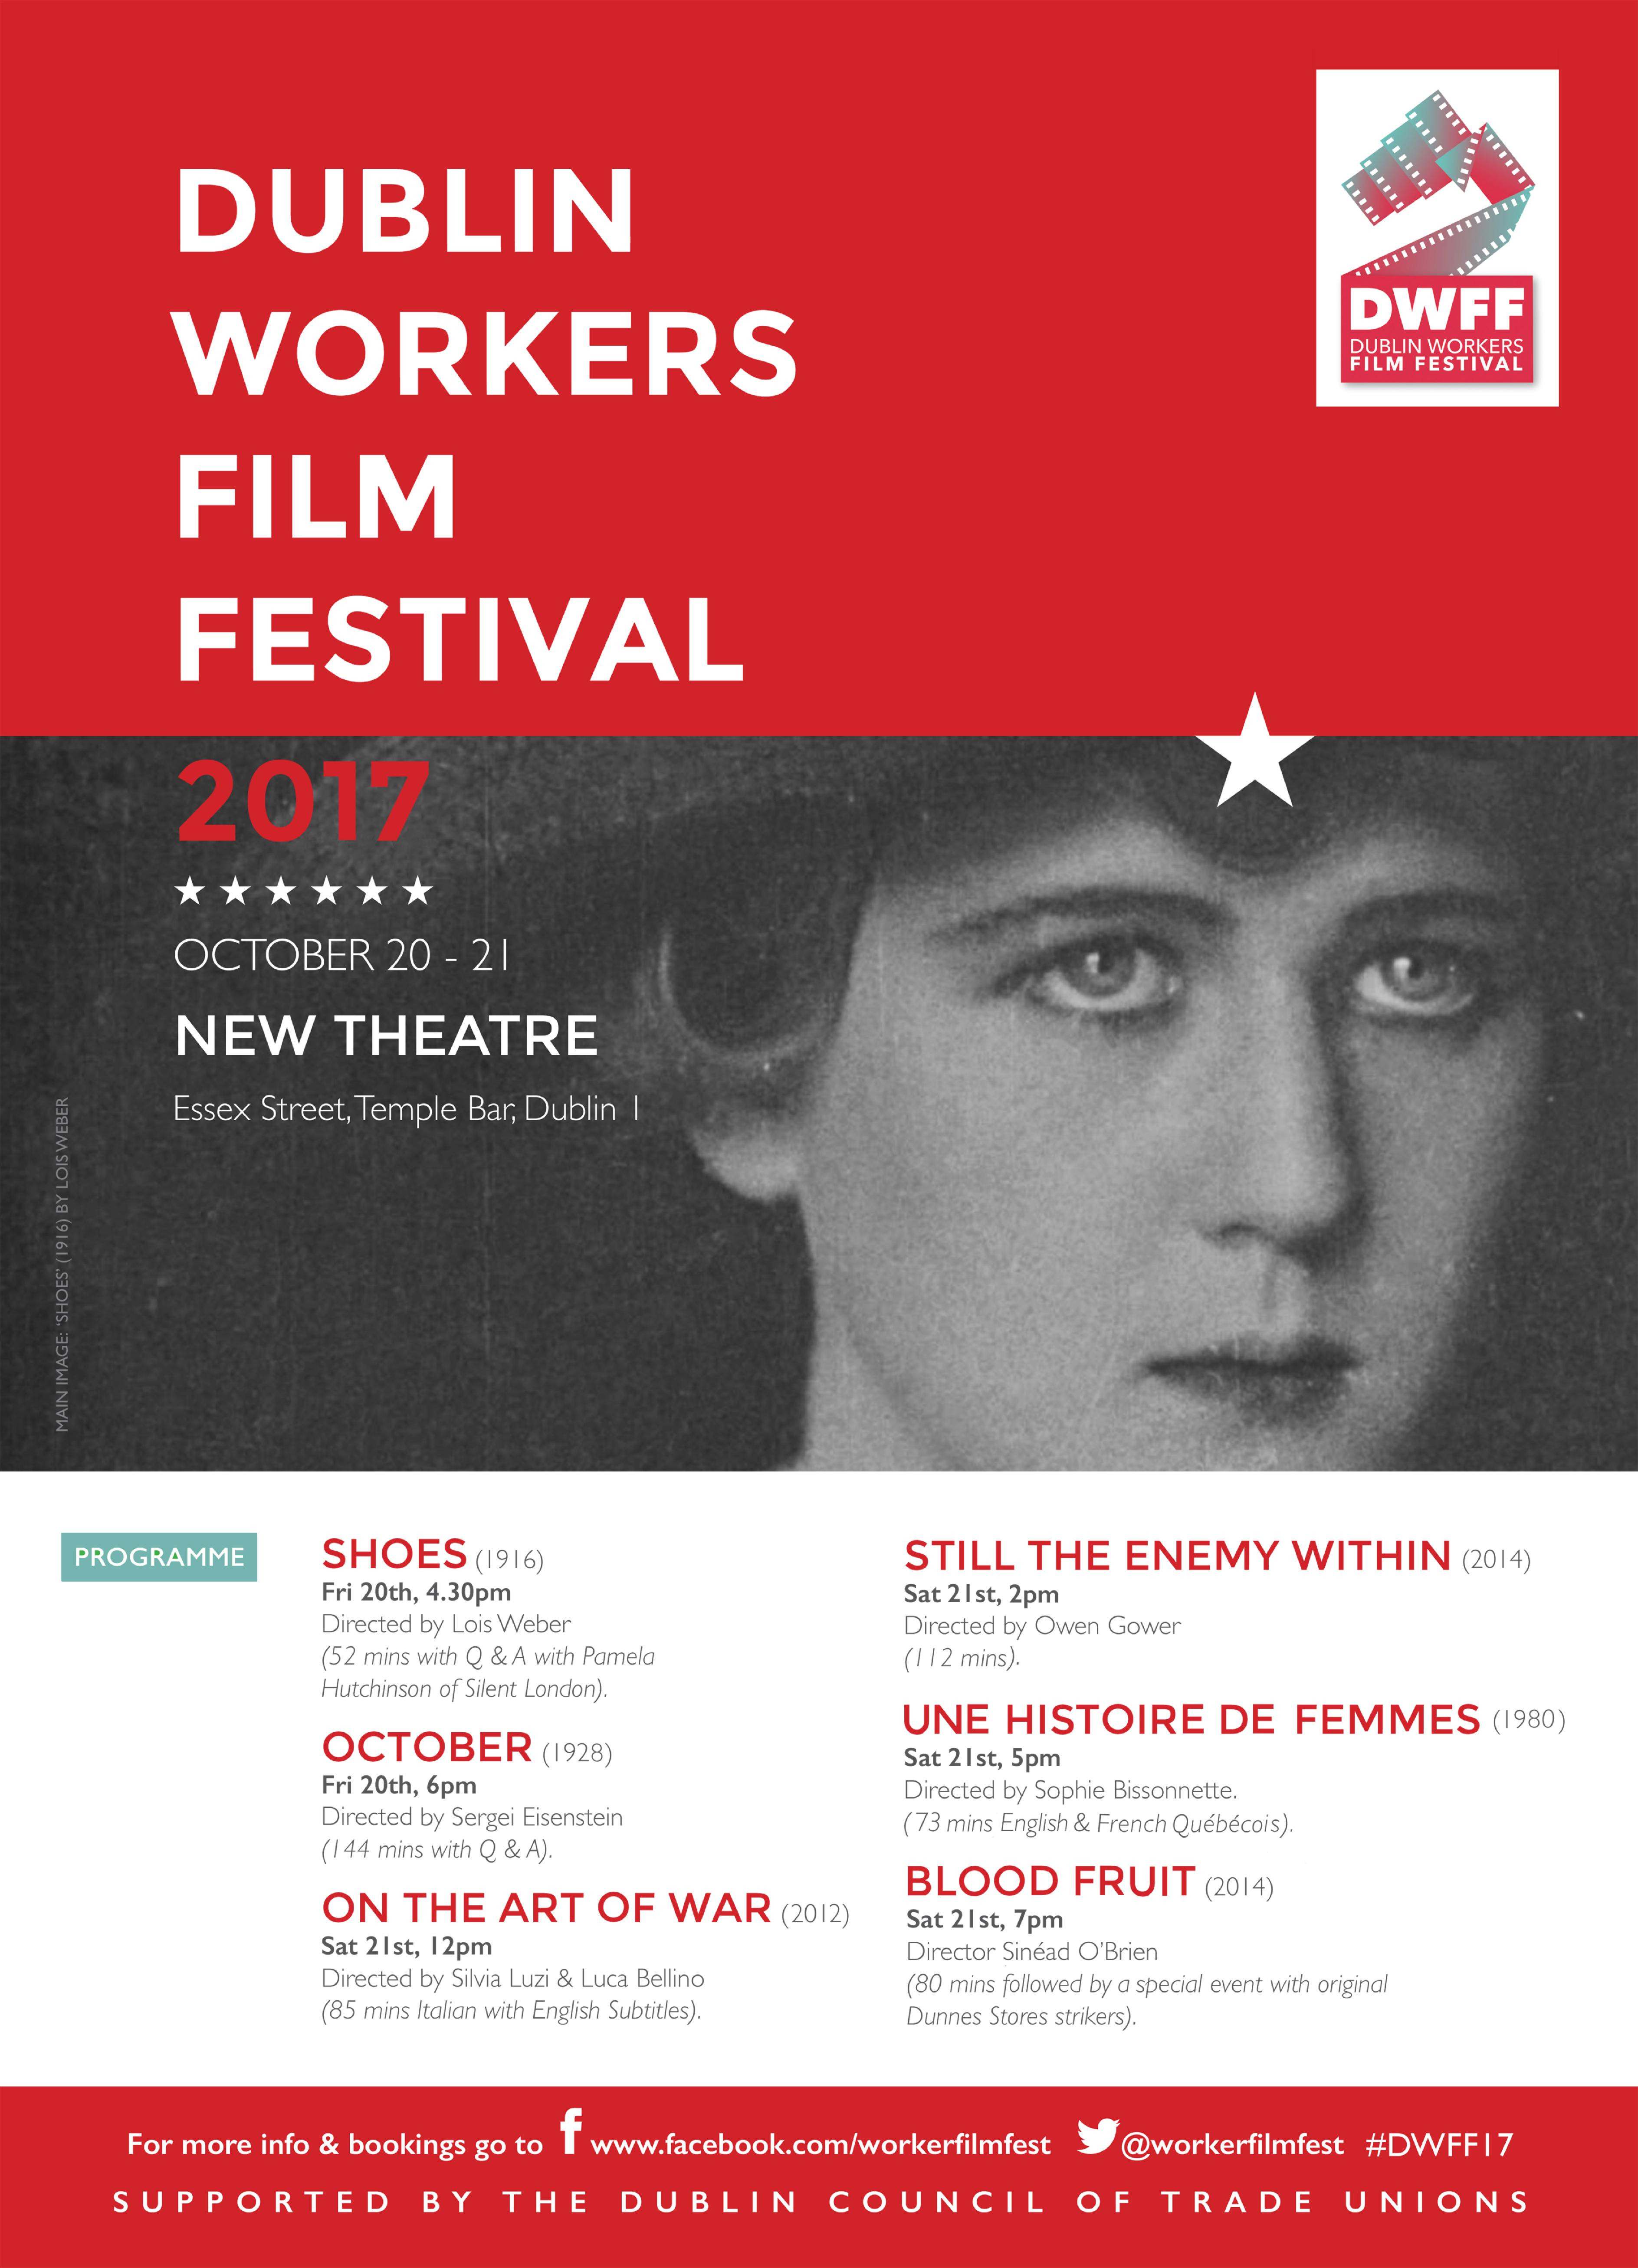 Dublin Workers Film Festival